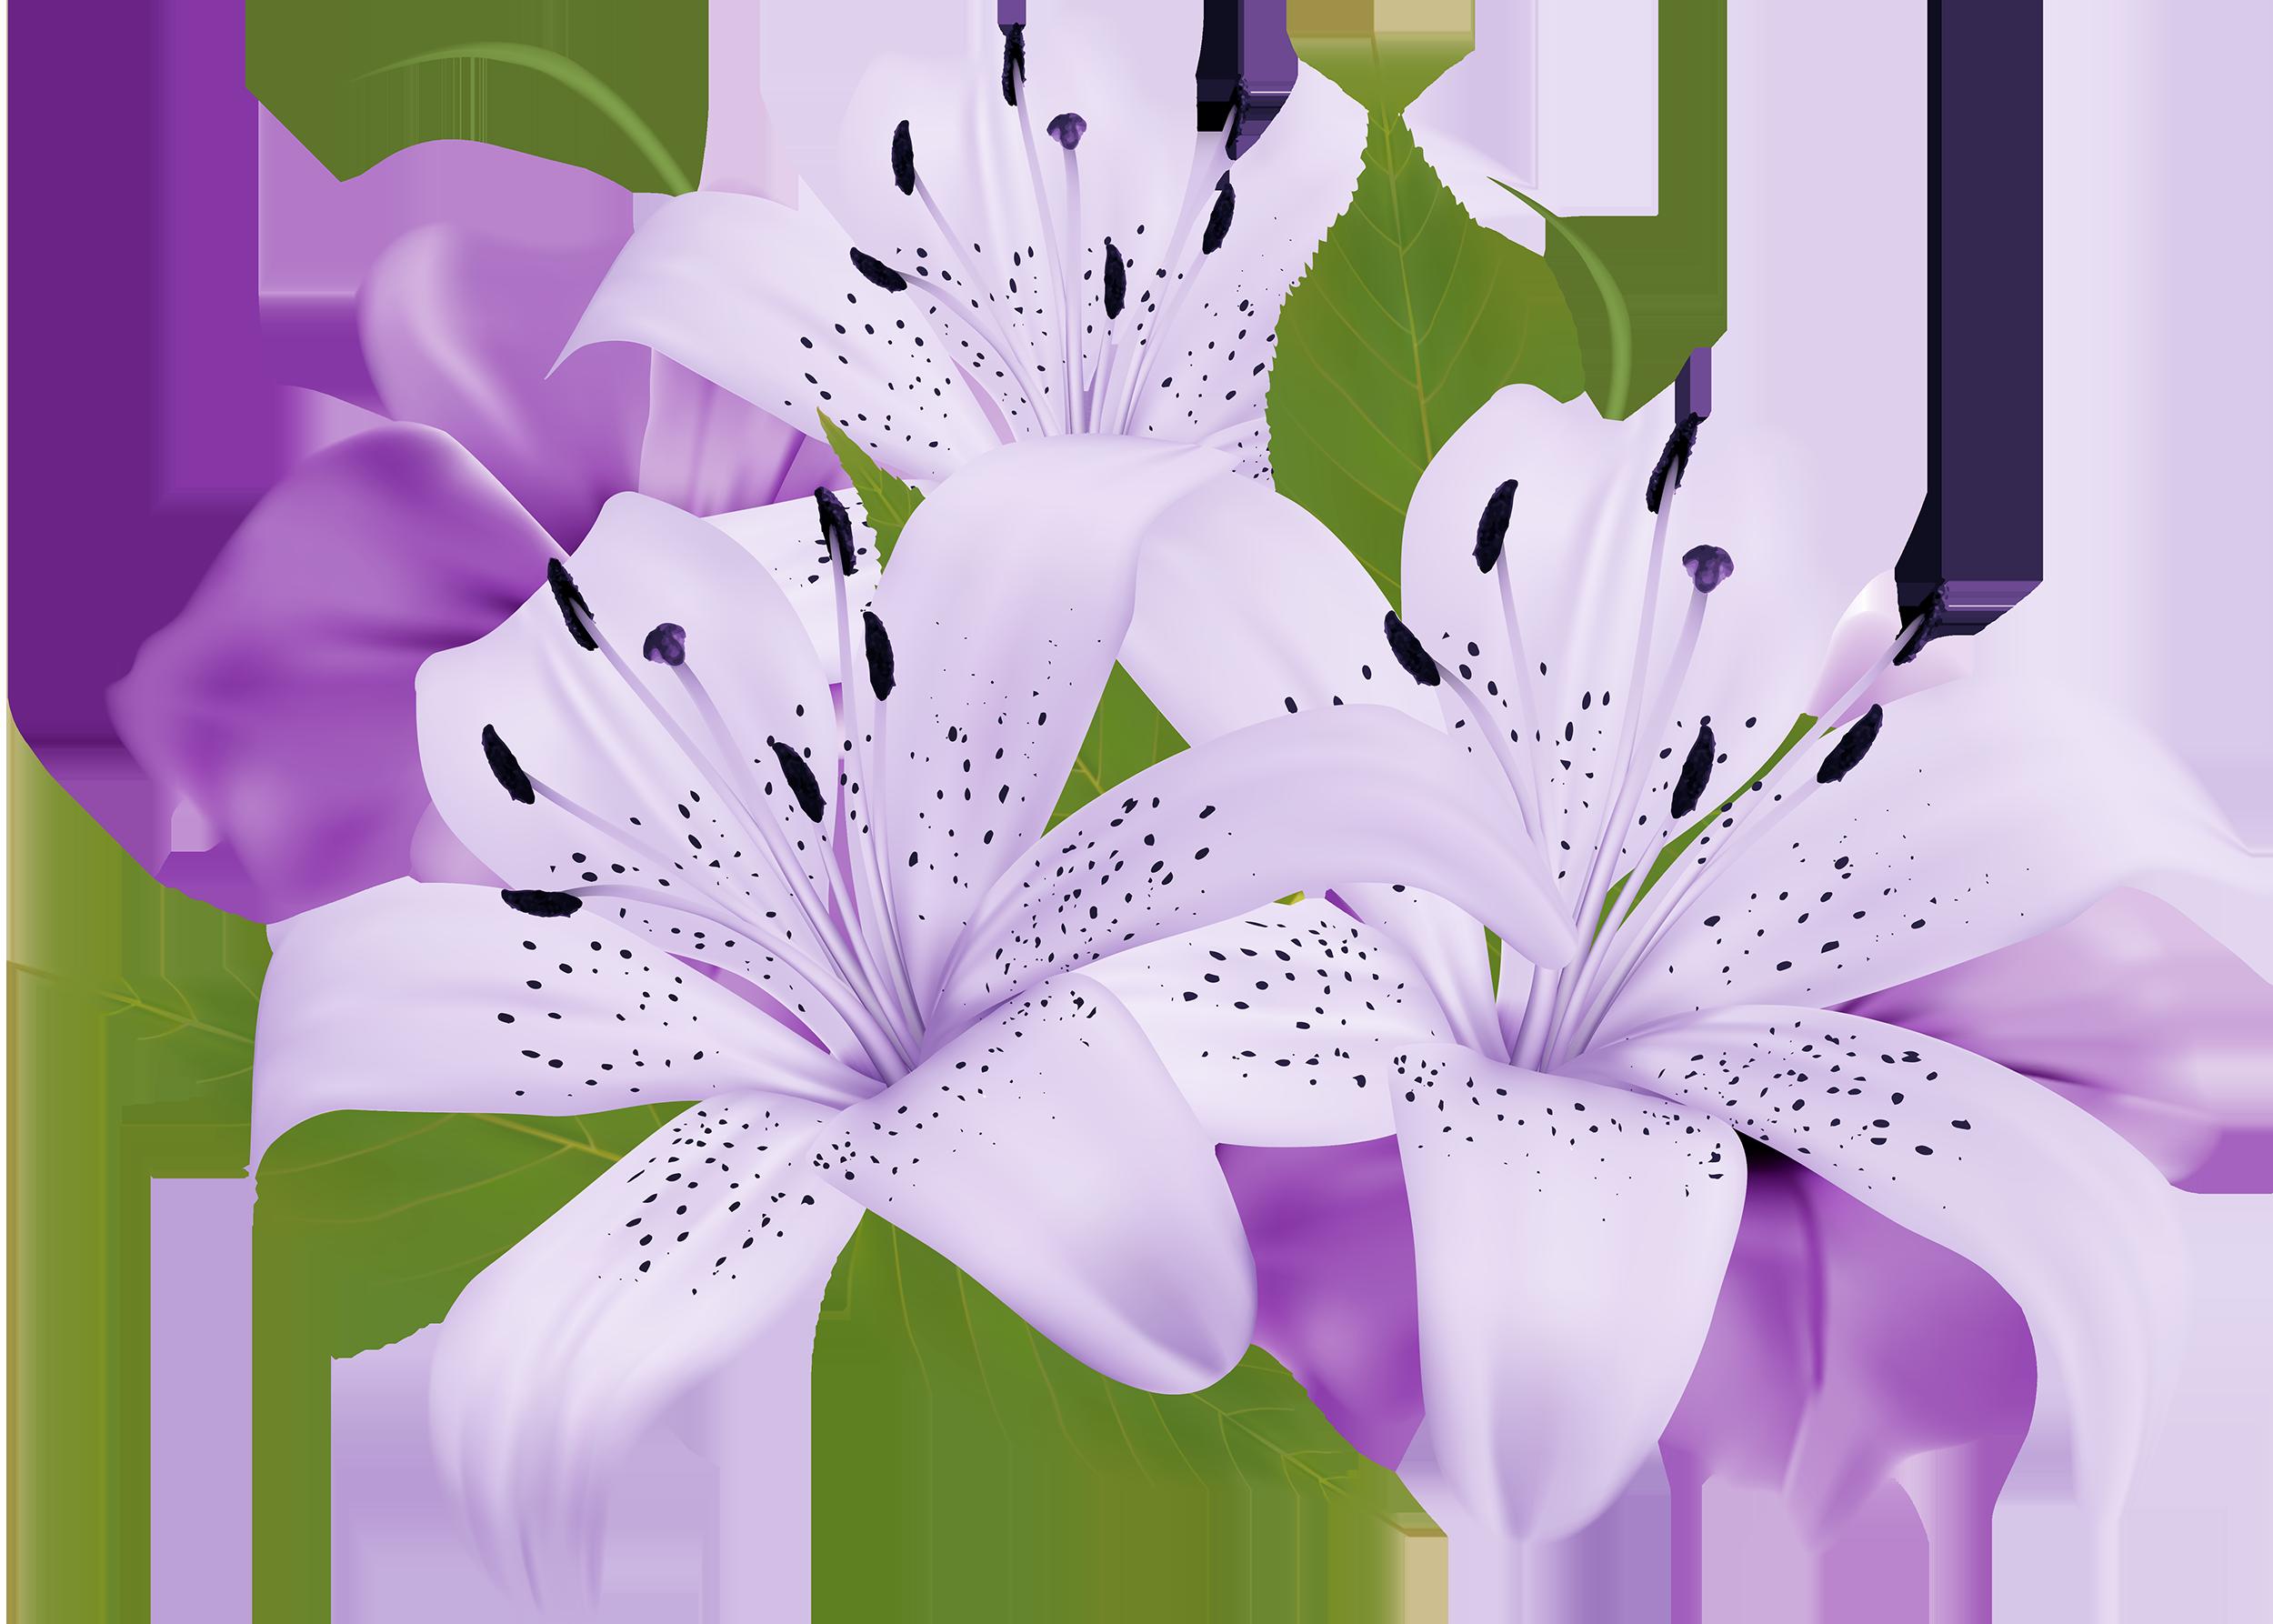 clip royalty free library Violet clipart violet flower. Purple decorative flowers png.